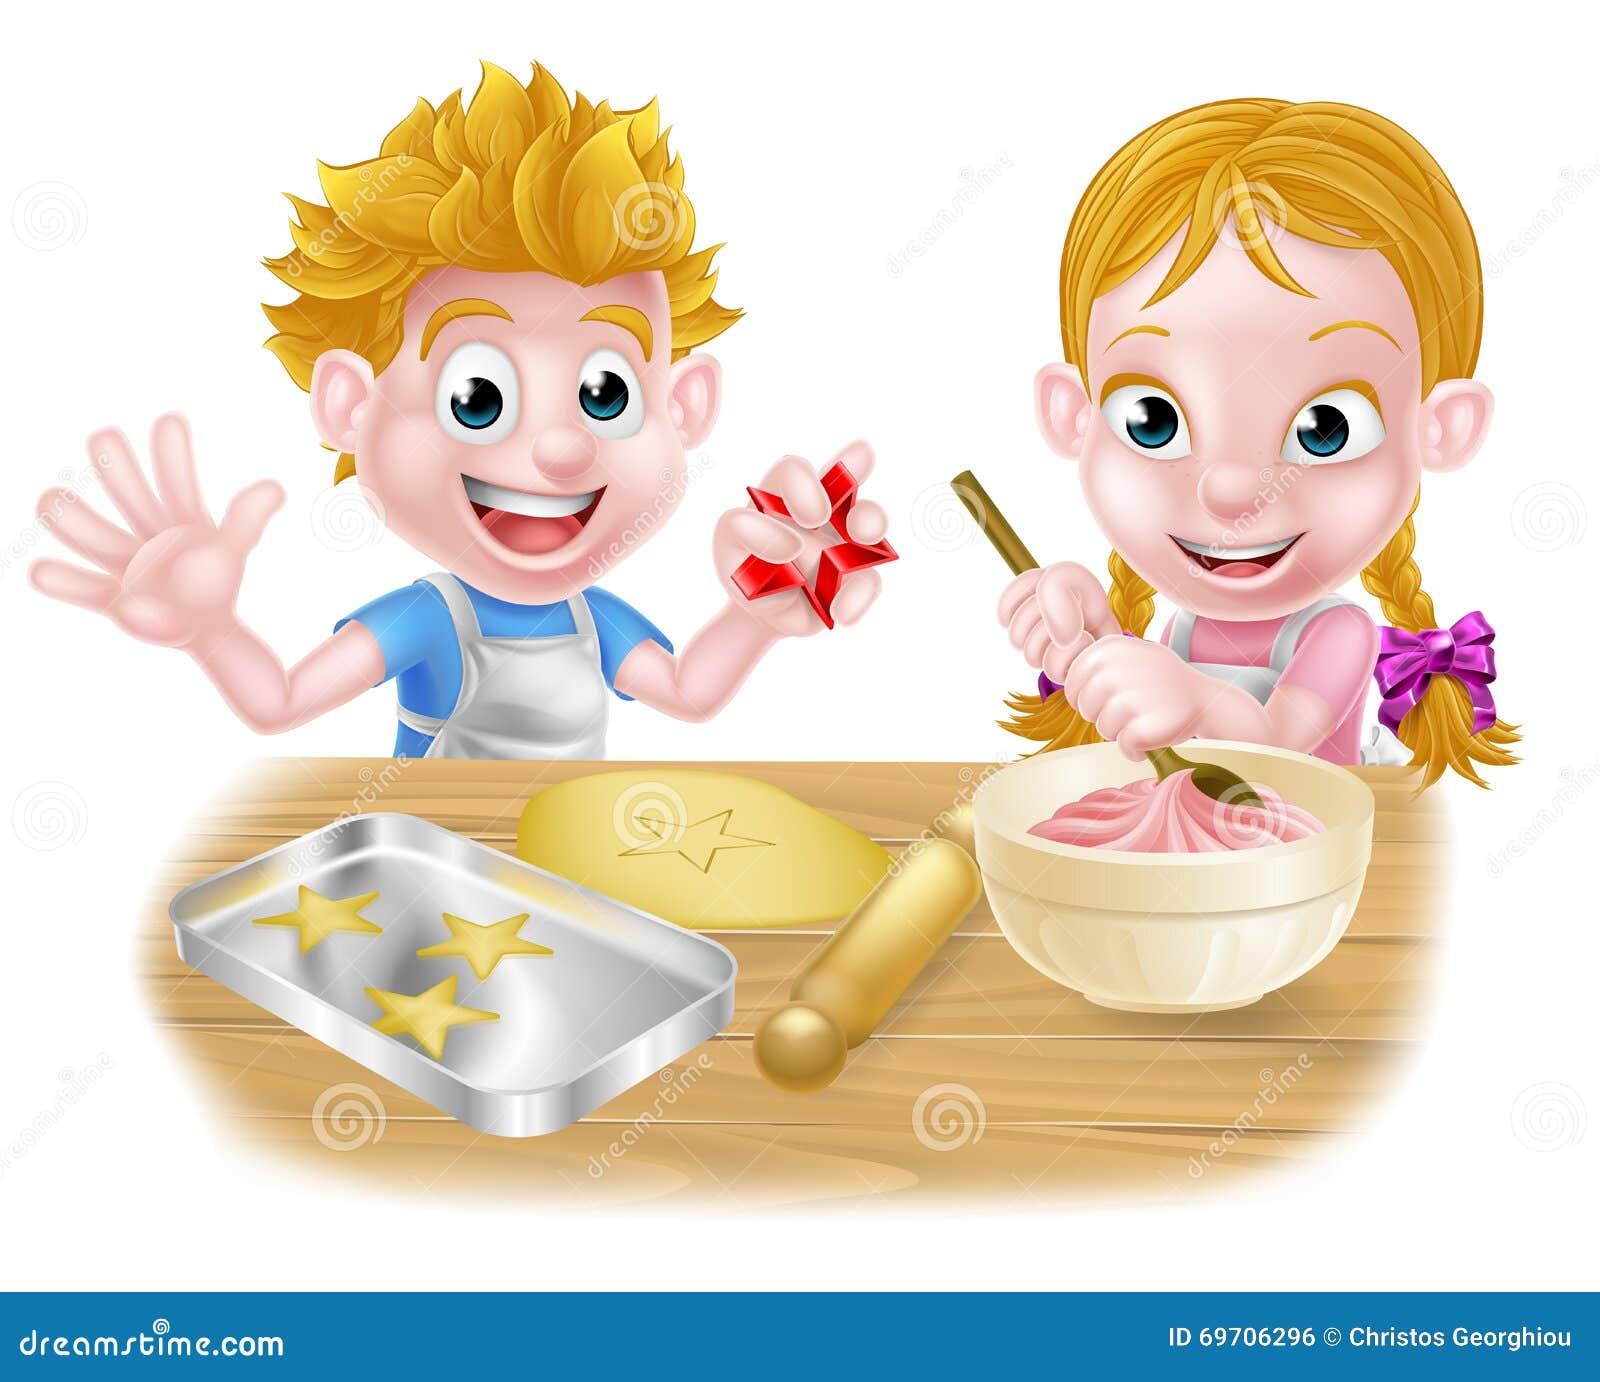 Design Your Kitchen Cartoon Children Baking Stock Vector Image 69706296